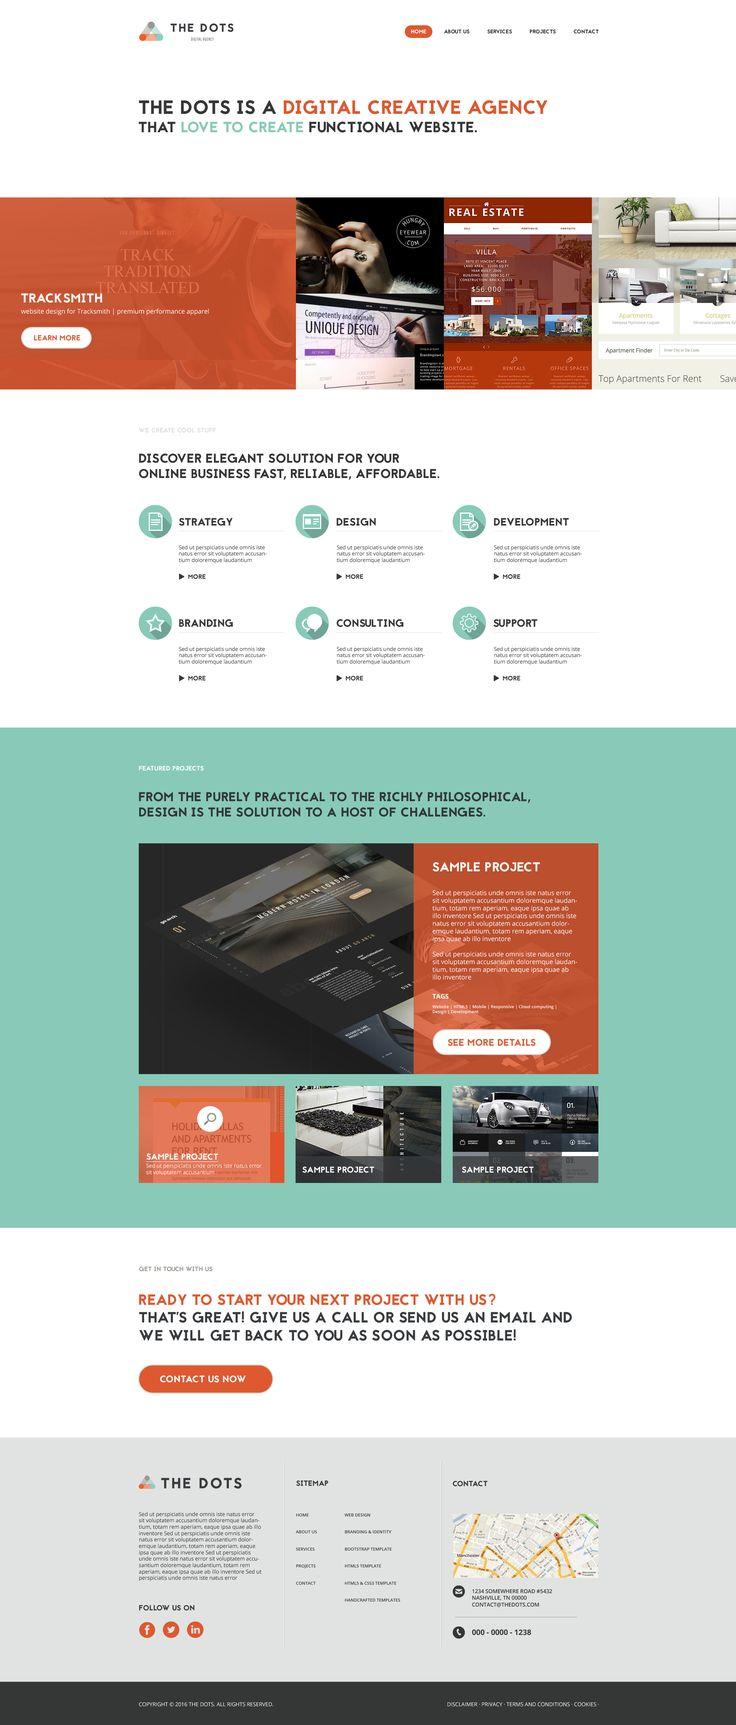 The Dots Website Design Concept